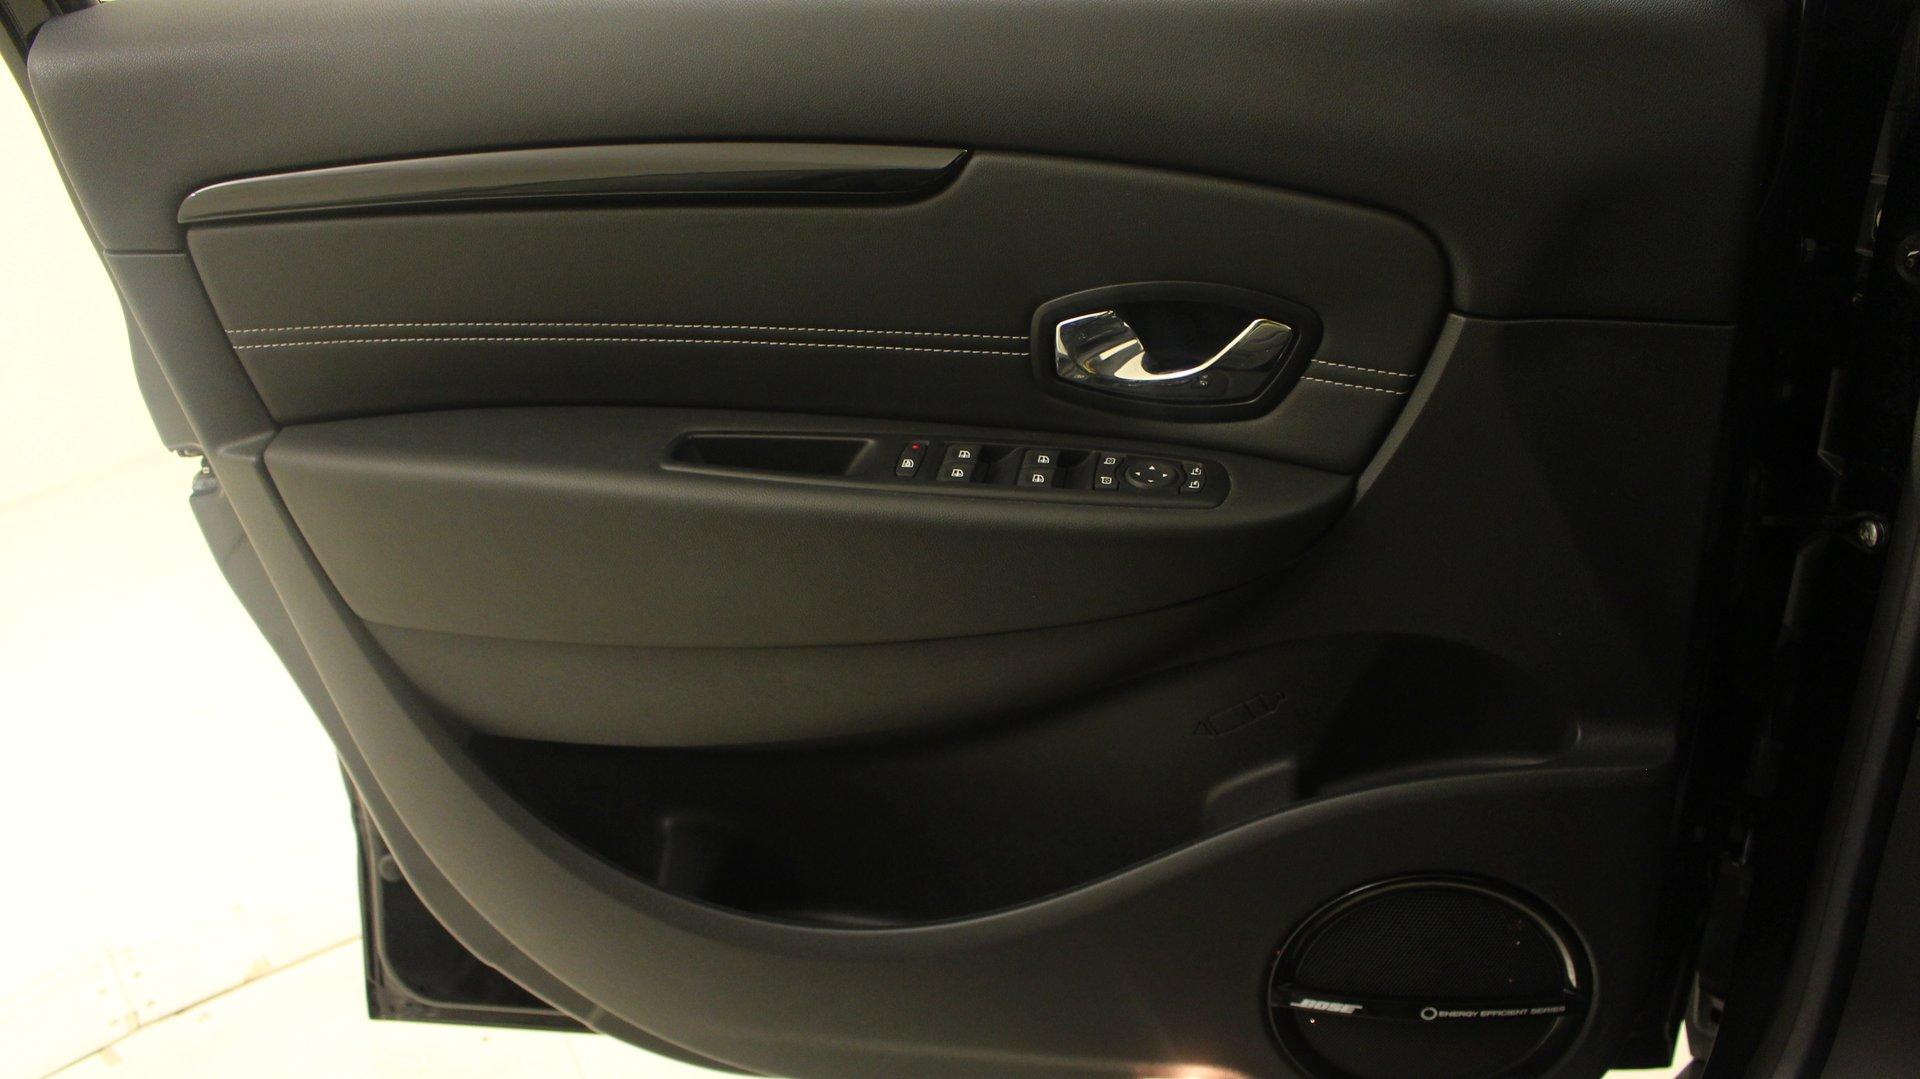 renault grand scenic 3 monospace 5 portes diesel dci 130 eco2 bo te manuelle. Black Bedroom Furniture Sets. Home Design Ideas